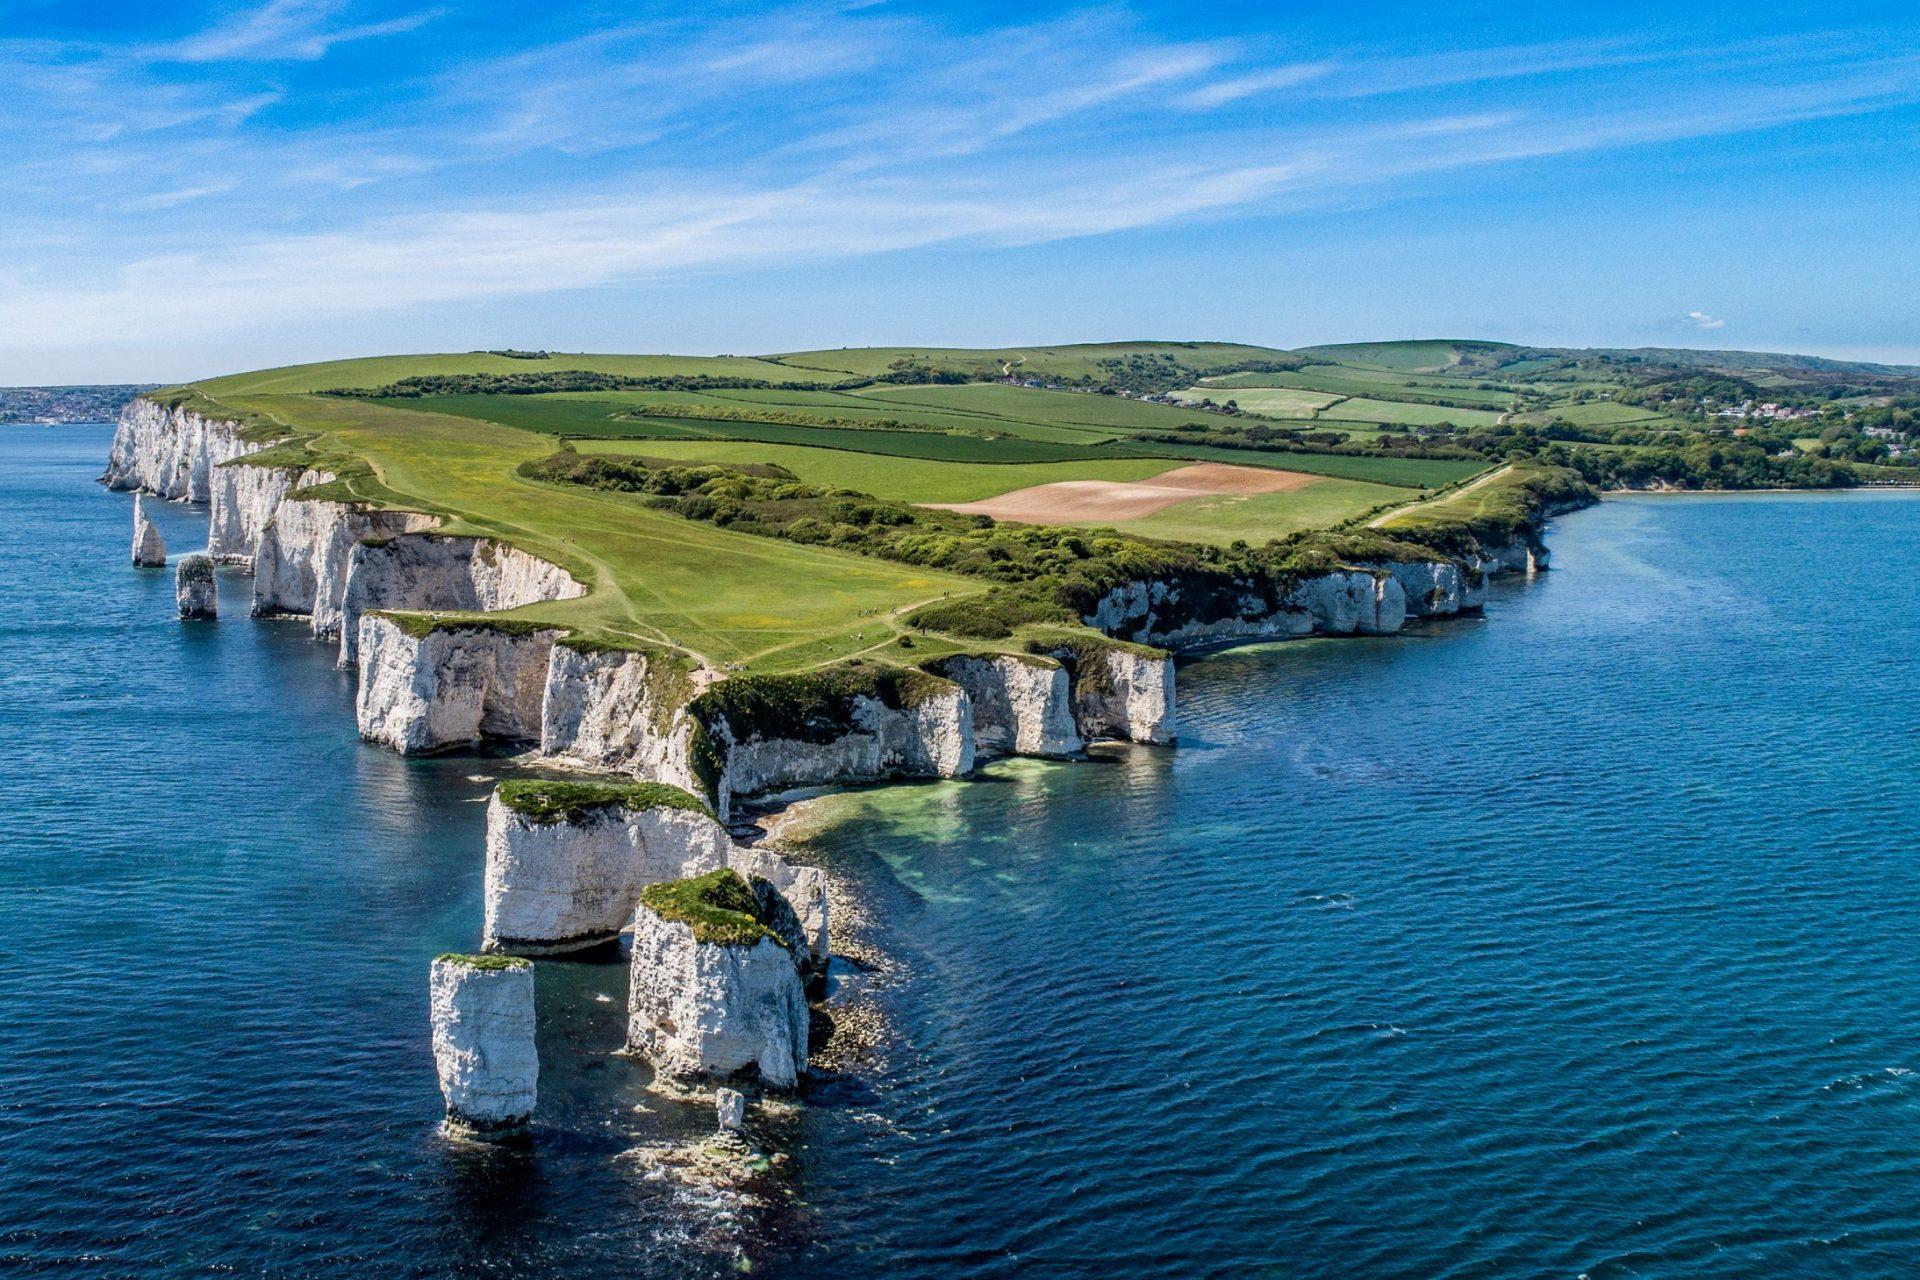 Old Harry Rocks, Jurassic Coast, Dorset